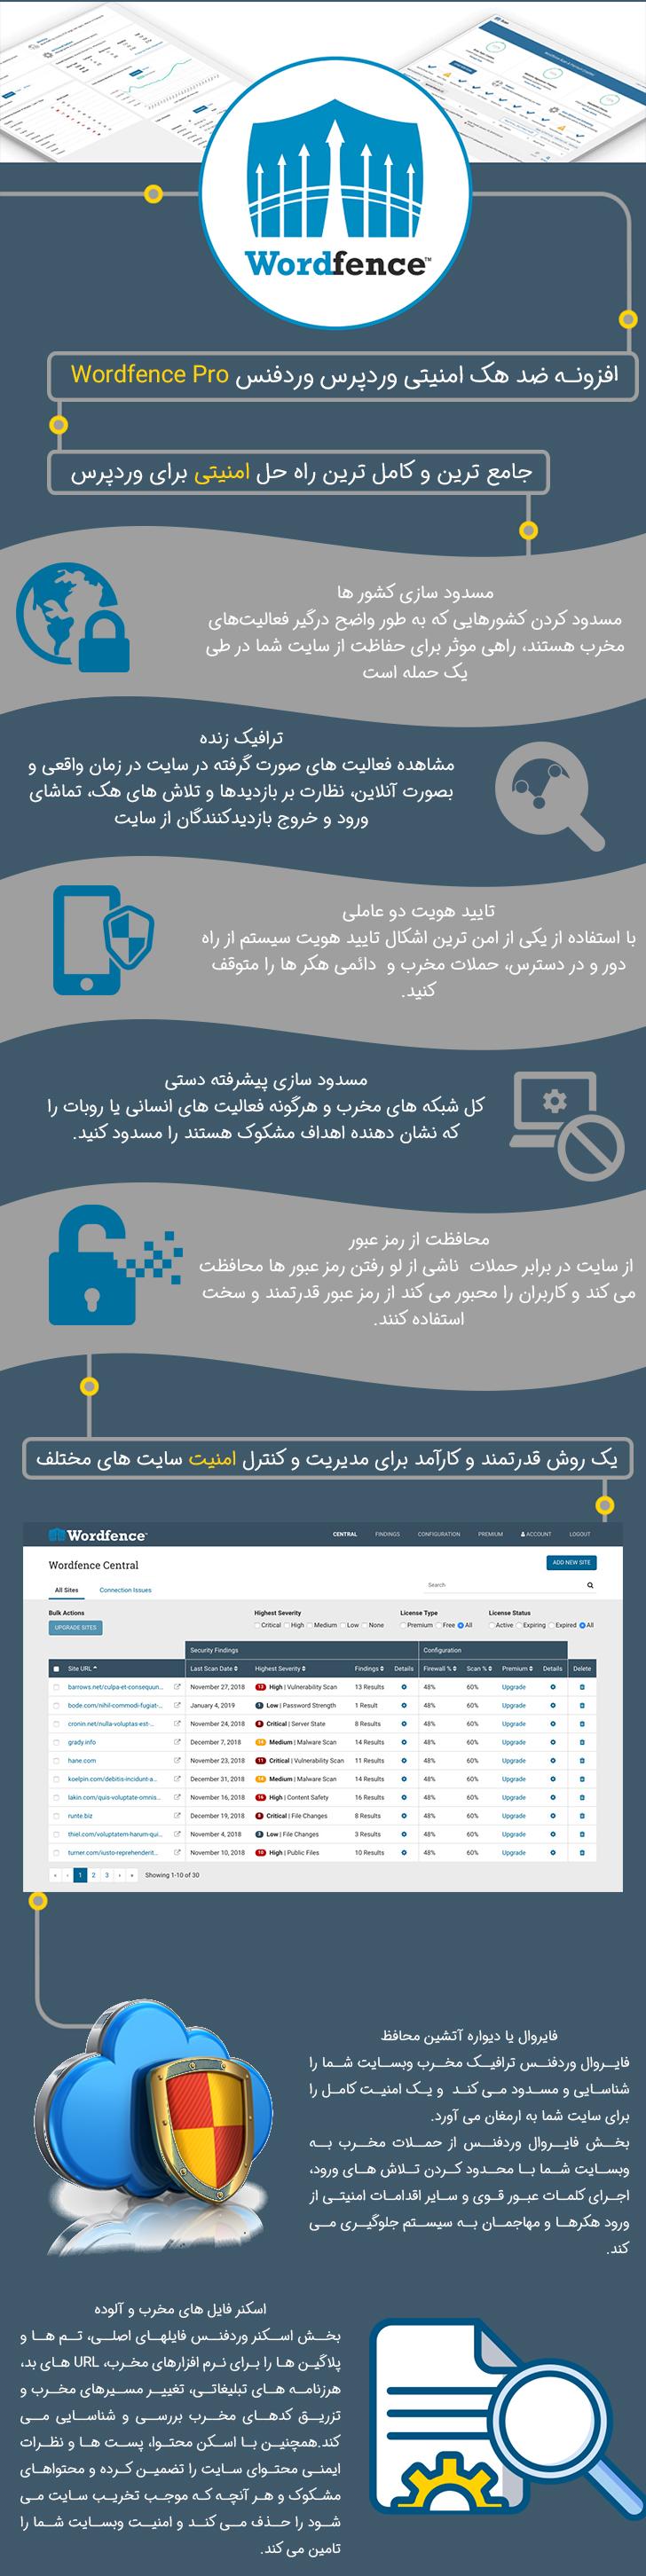 افزونه ضد هک امنیتی وردپرس وردفنس Wordfence Pro